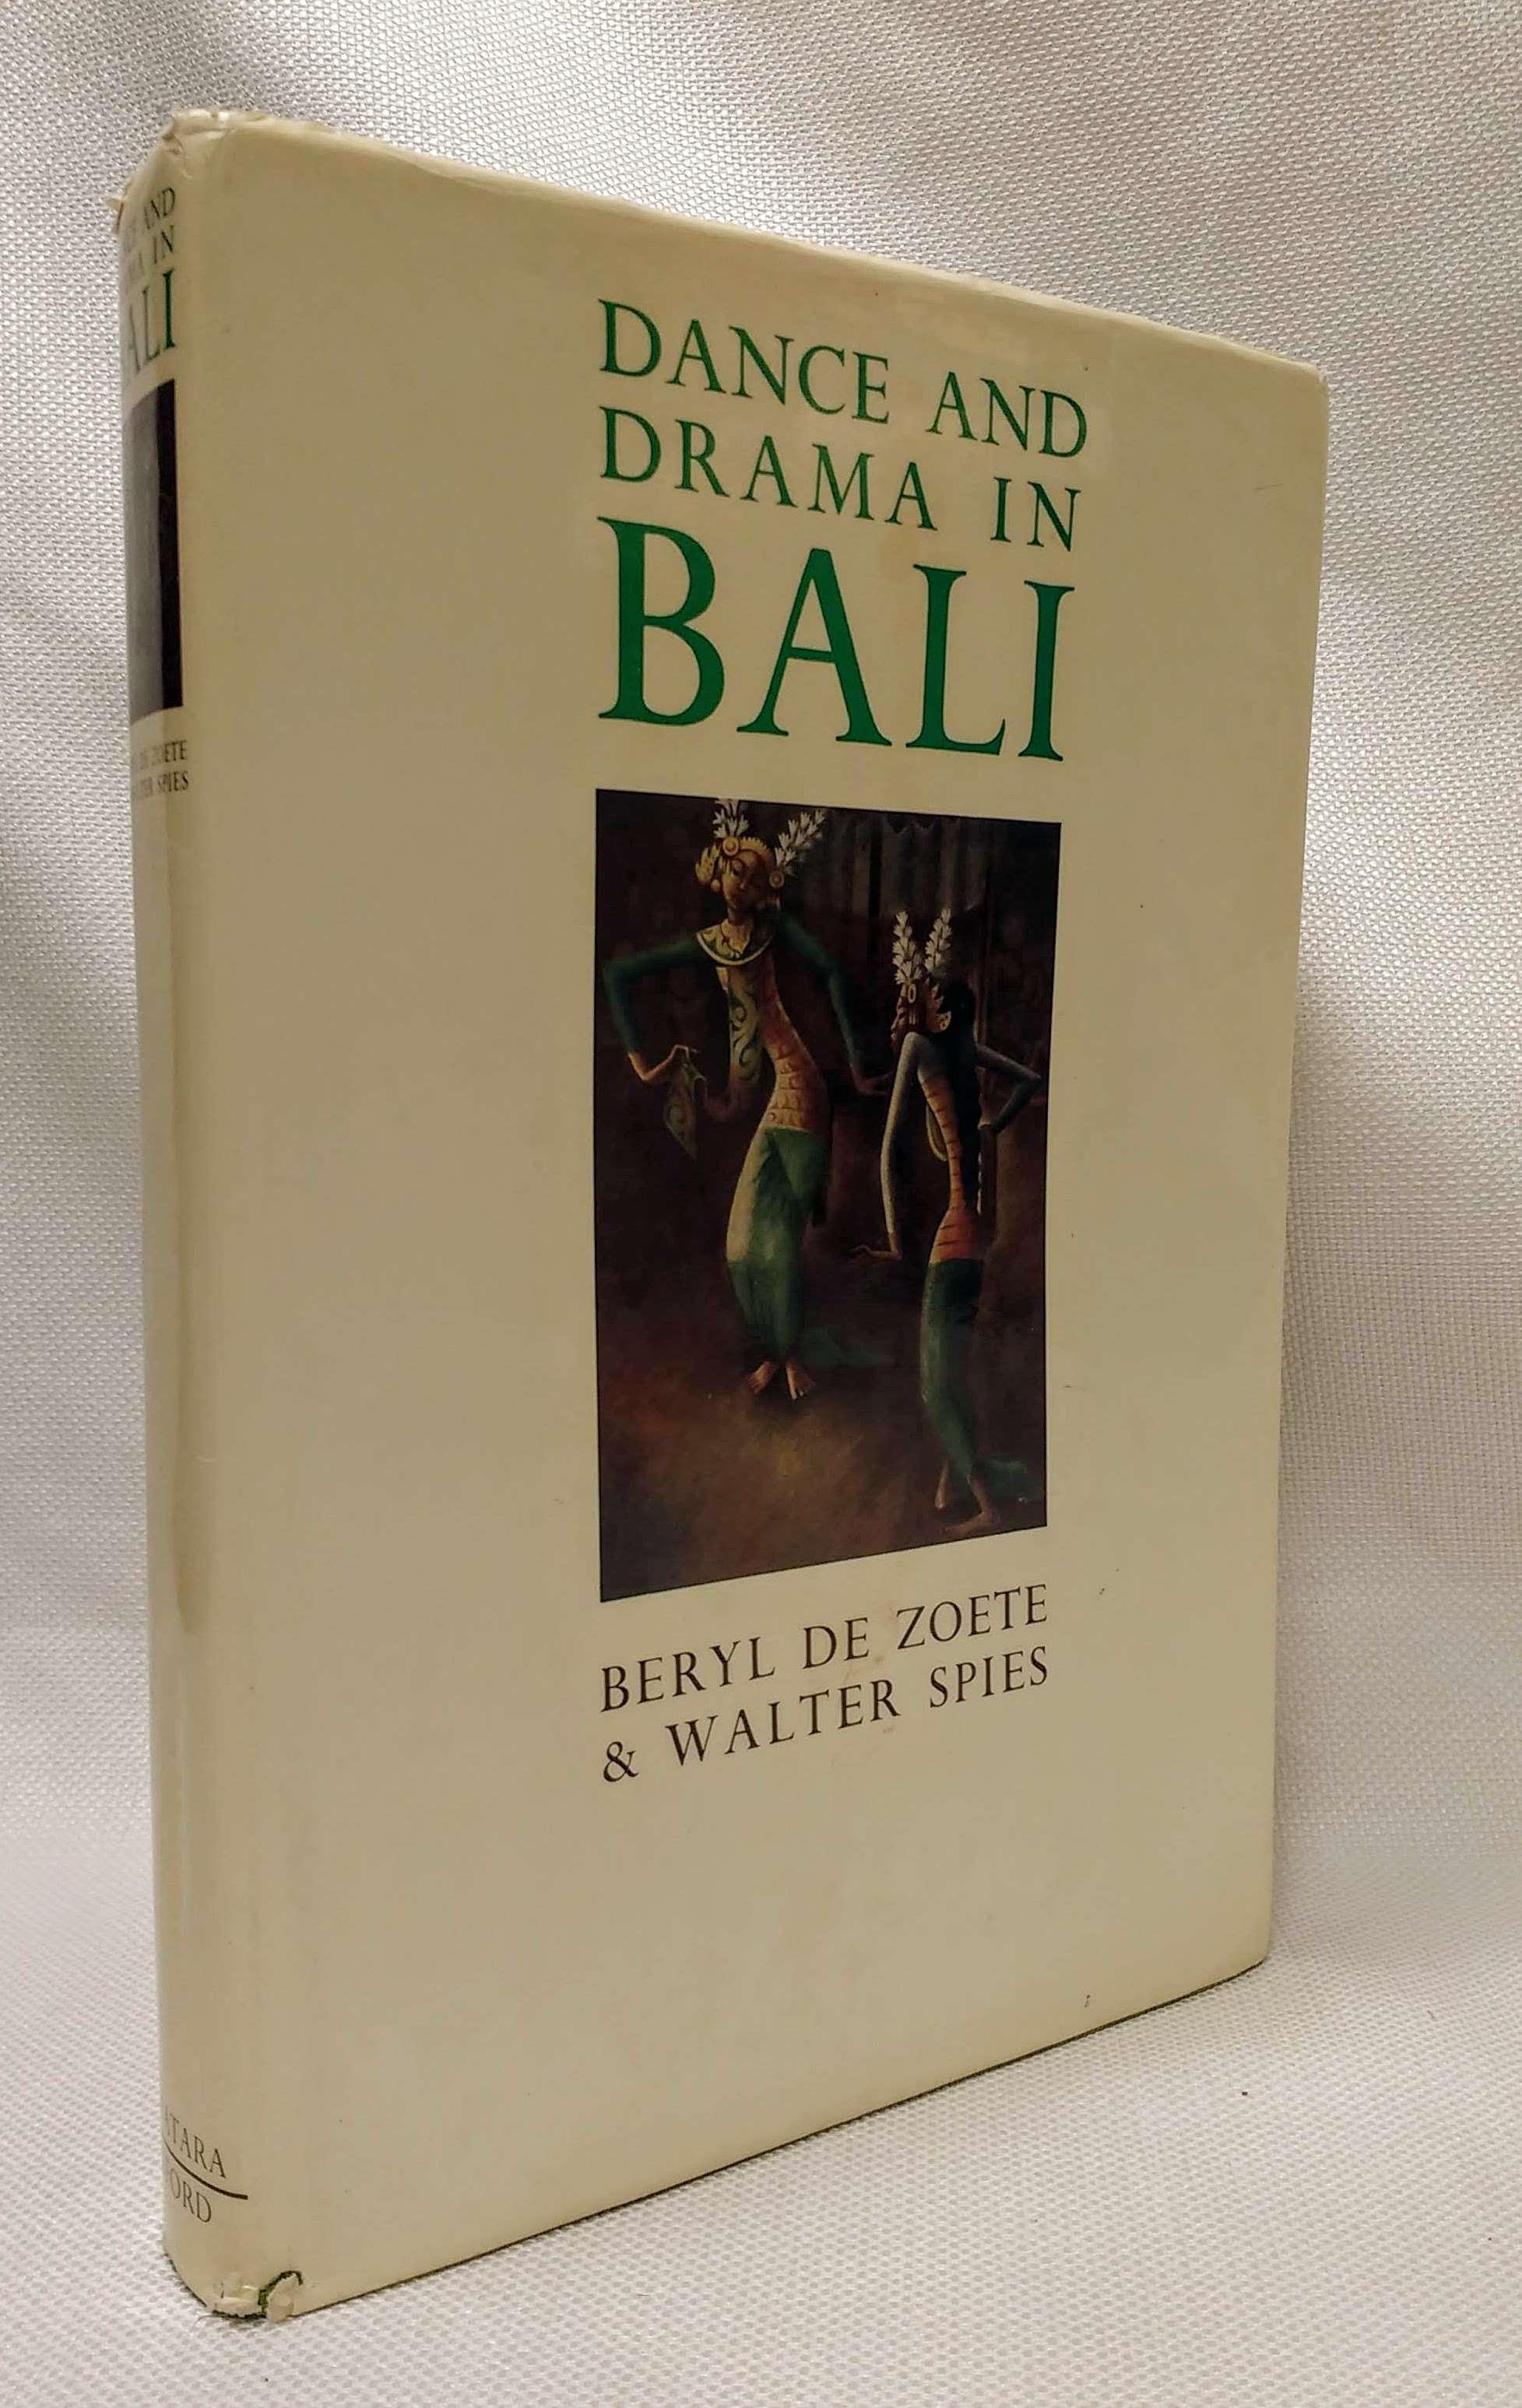 Dance and Drama in Bali, De Zoete, Beryl & Spies, Walter; Waley, Arthur [preface]